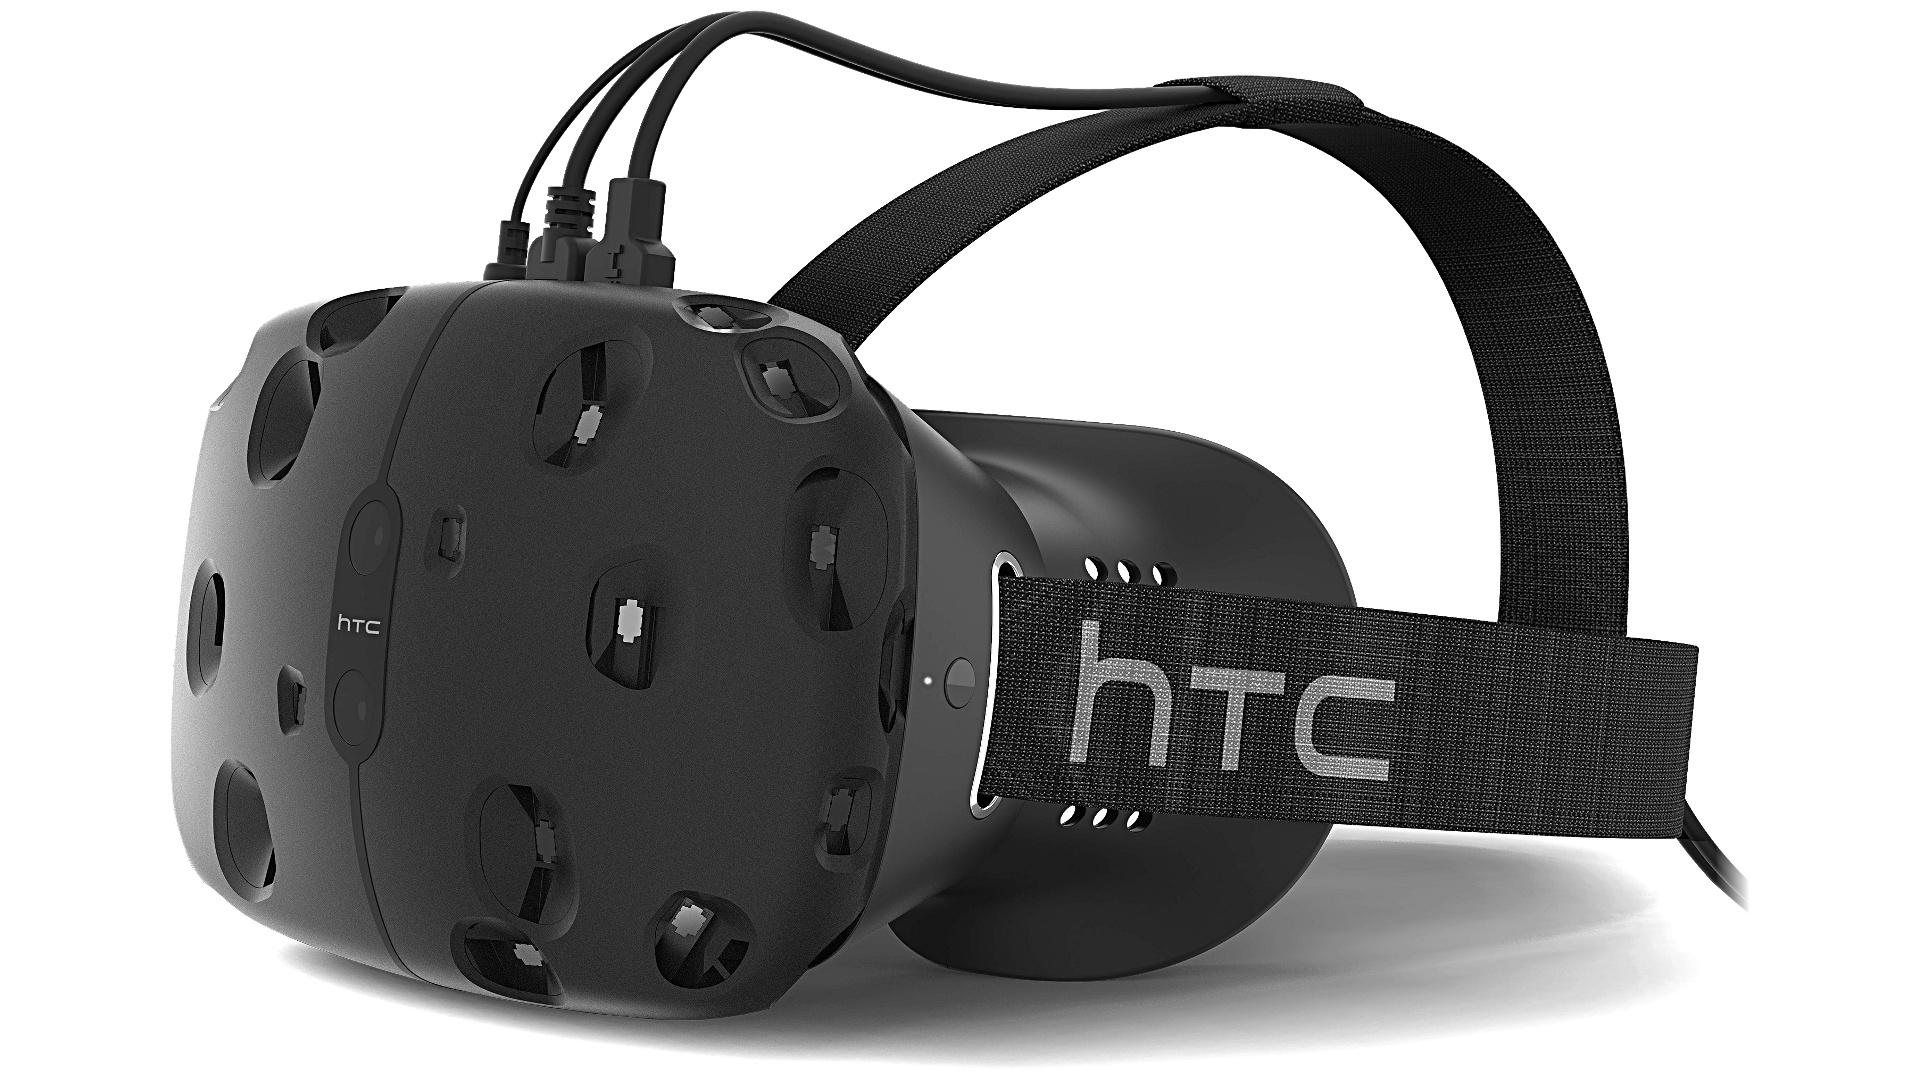 HTC Vive VR Head Mounted Display